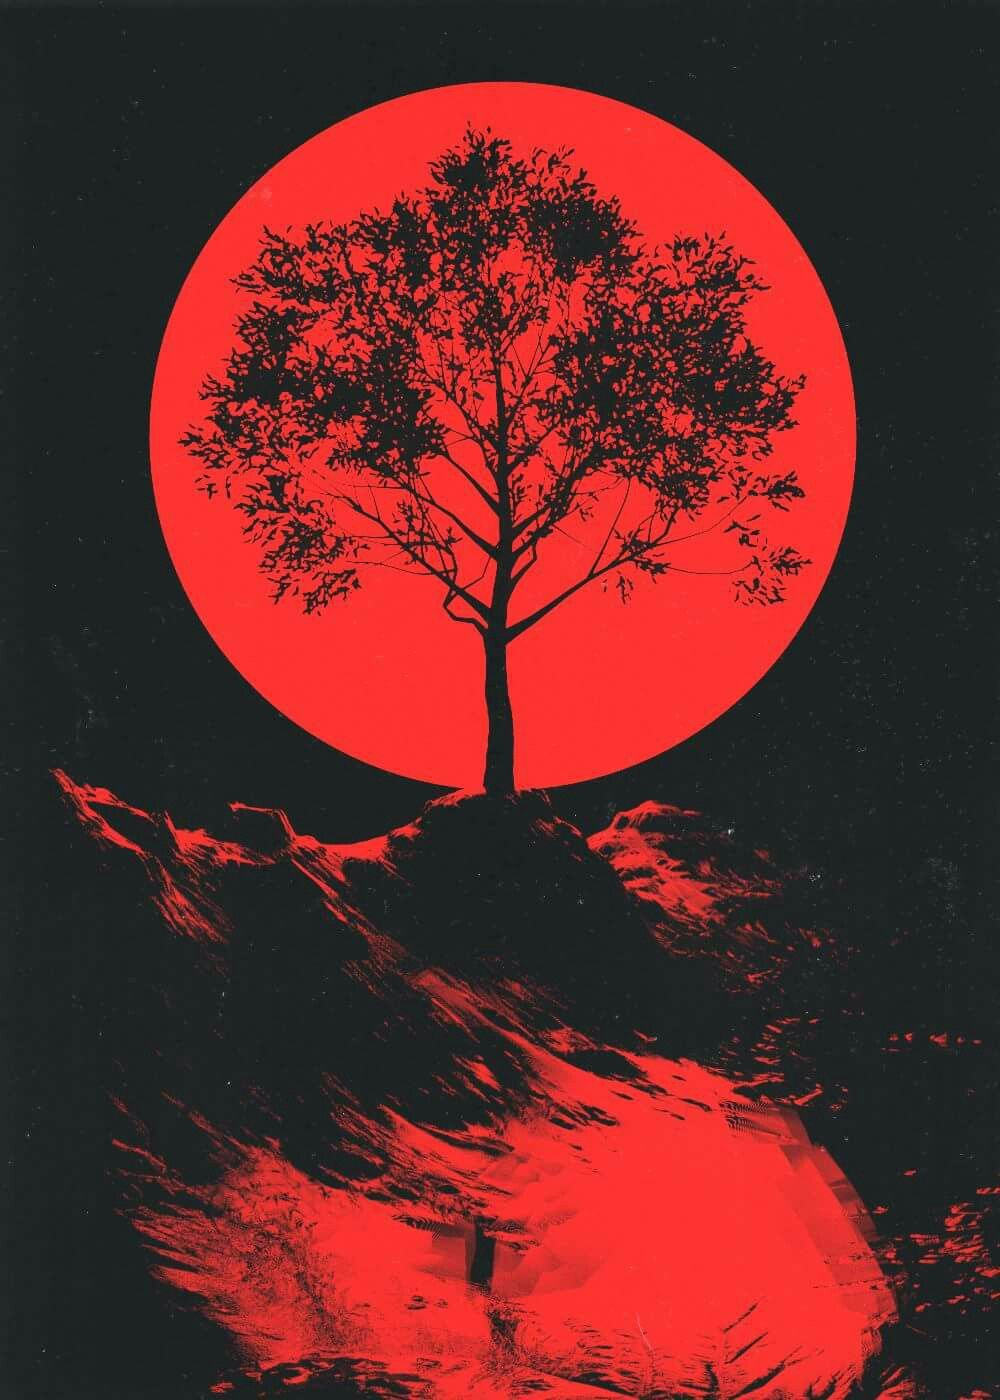 Pin By Thenewbegining On Art Dark Red Wallpaper Red And Black Wallpaper Dark Wallpaper